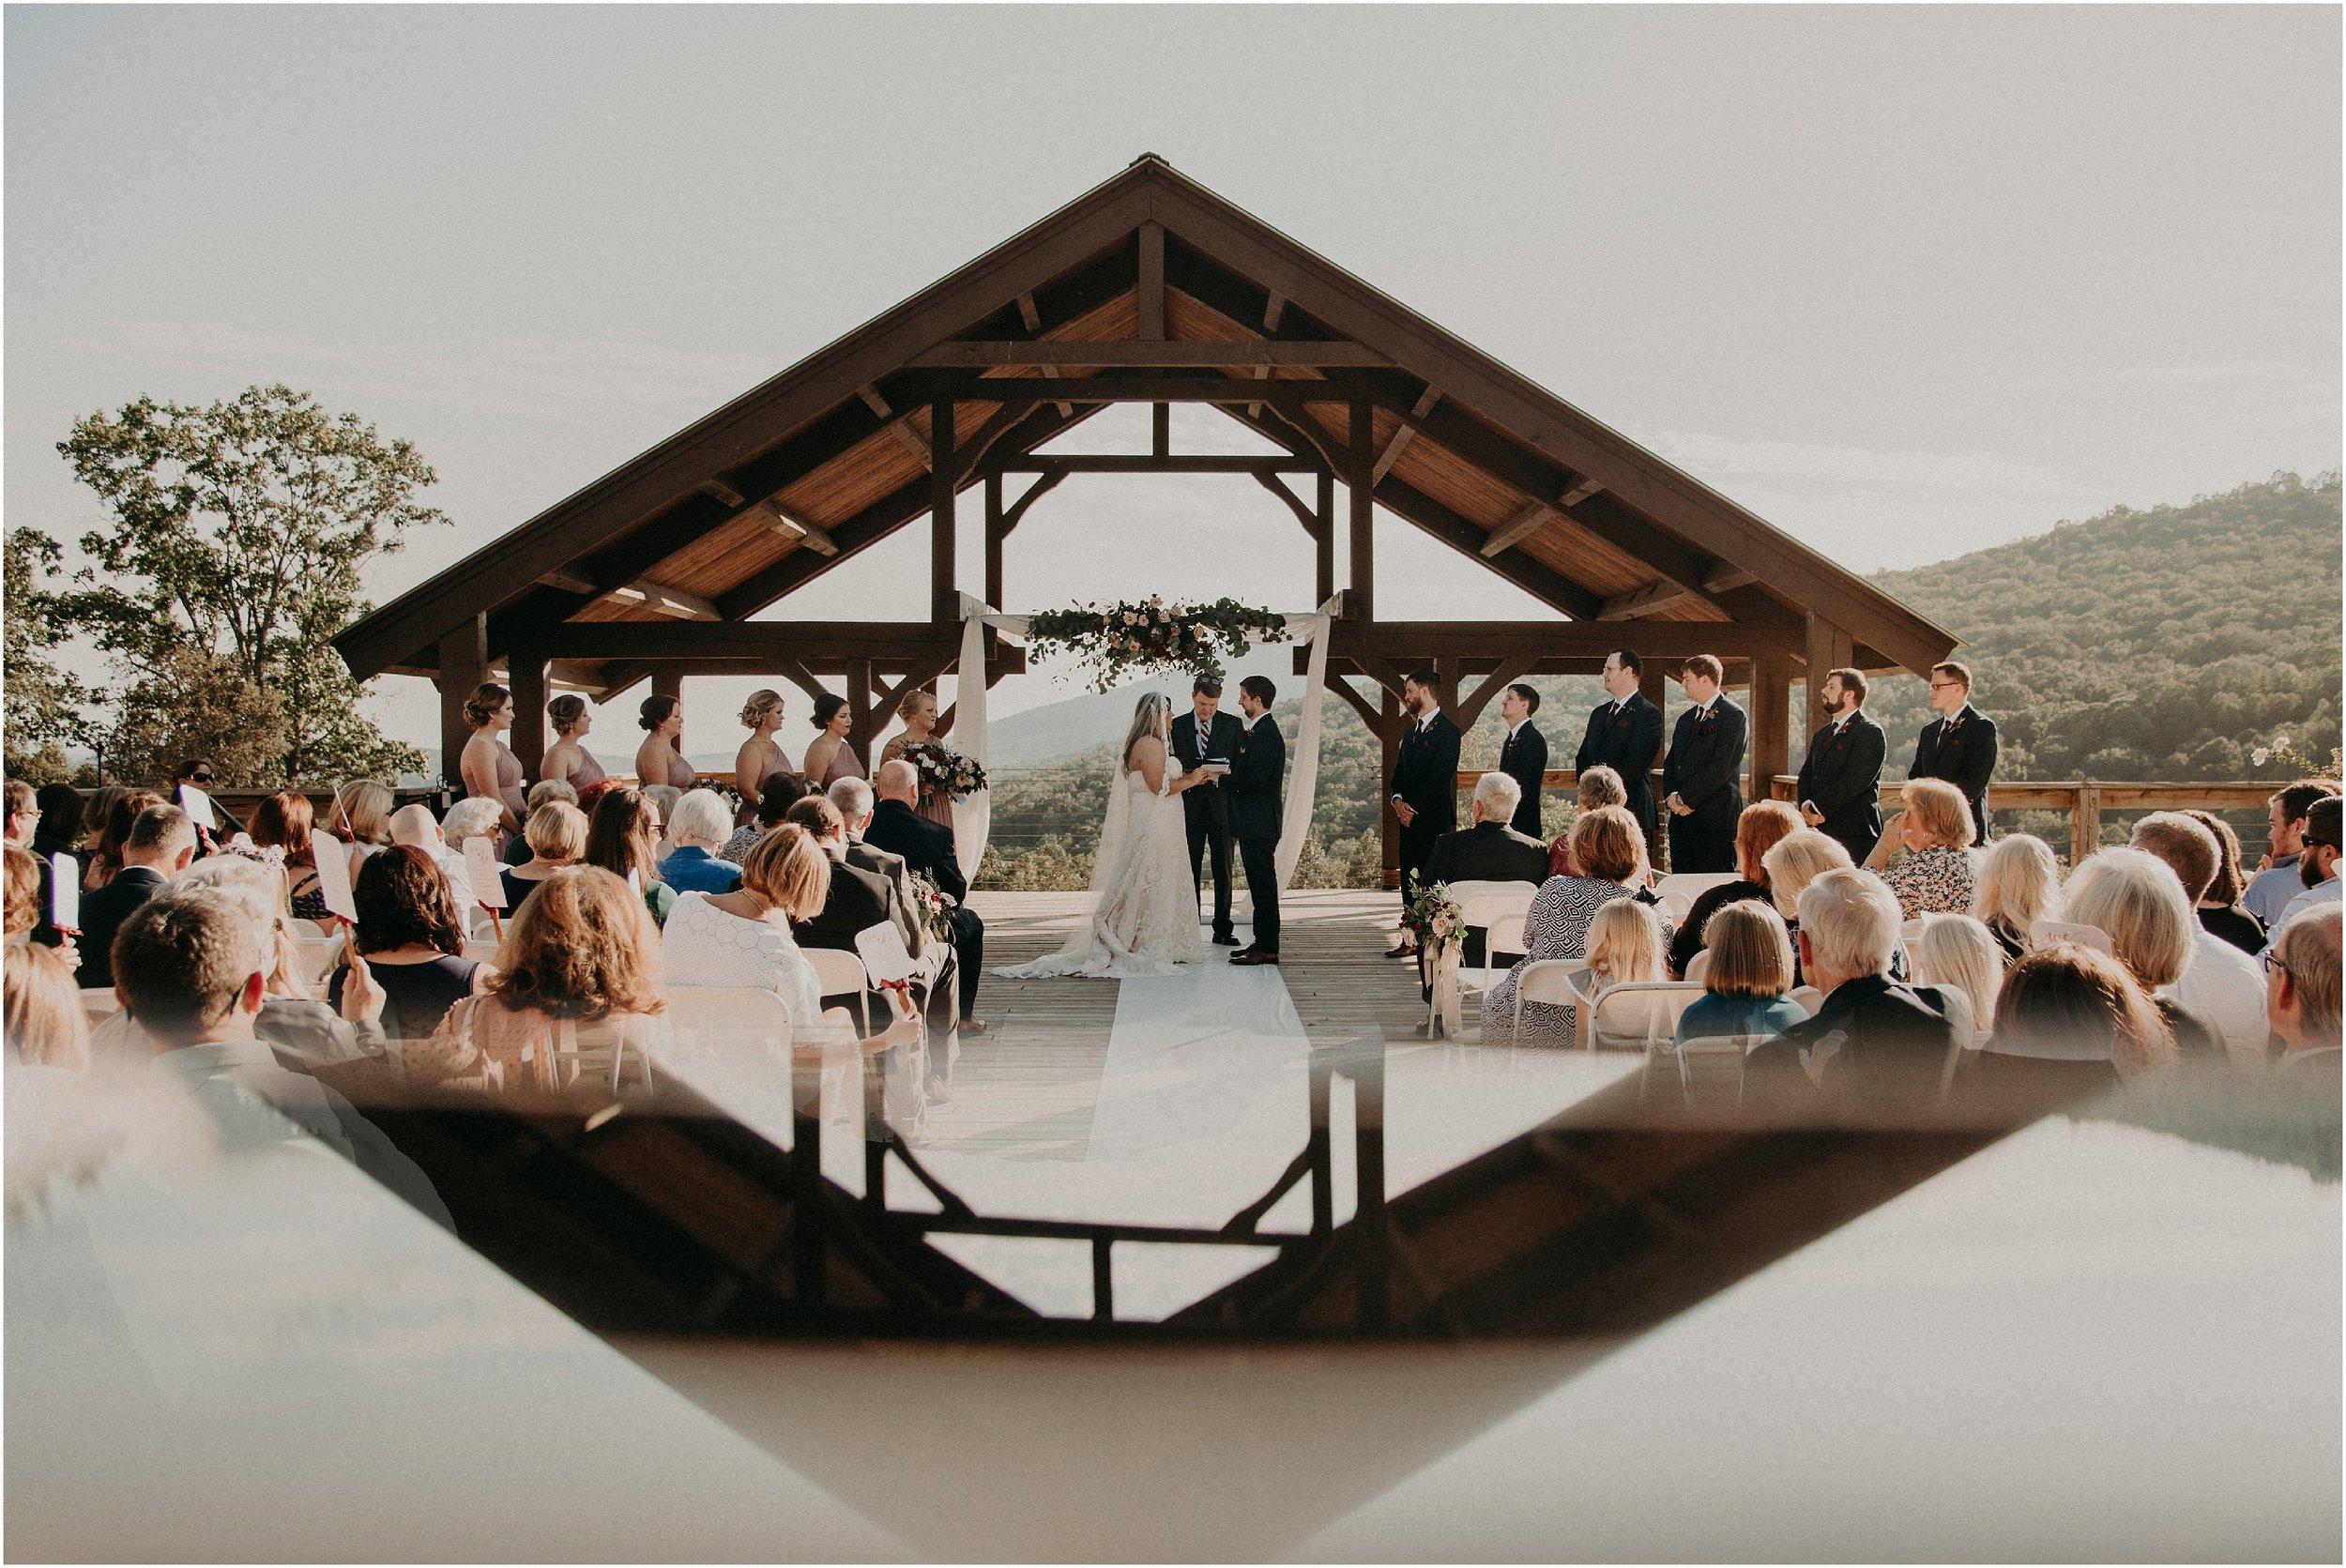 Fine art wedding ceremony image with reflection of deck arbor